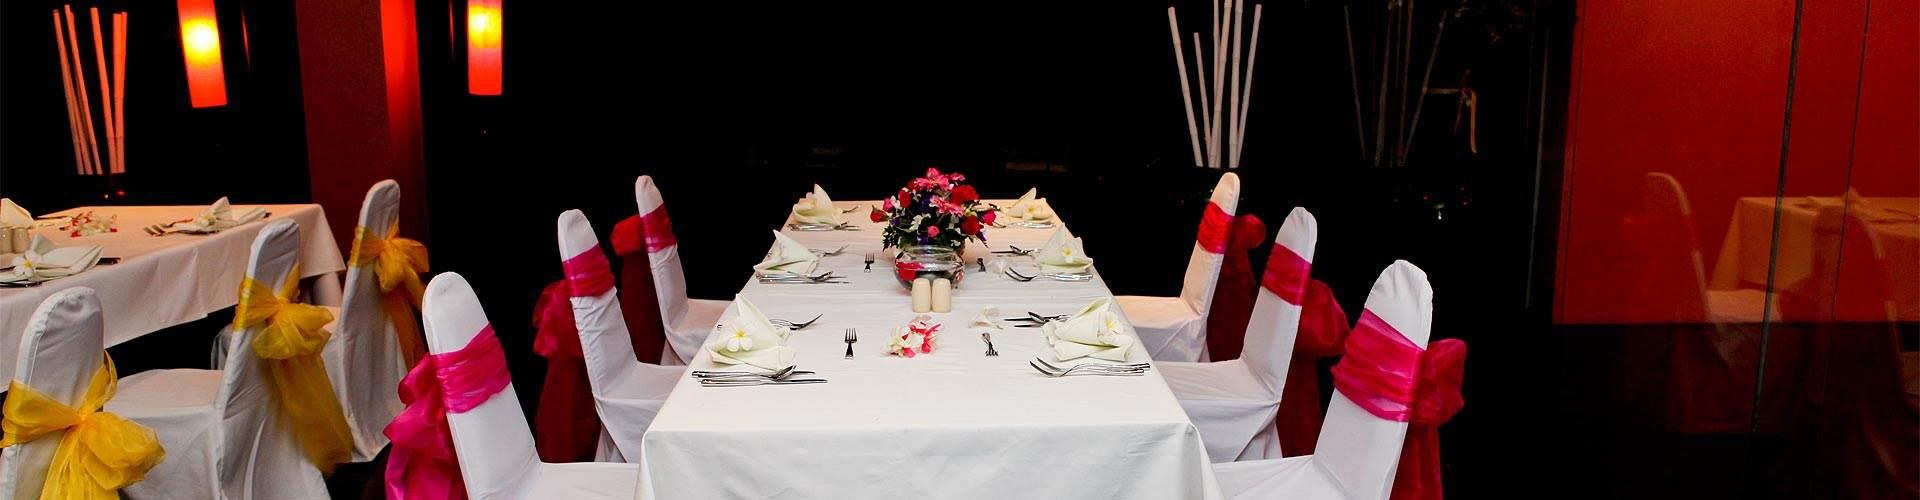 cena nochevieja en restaurantes de Vilanova i la Geltrú